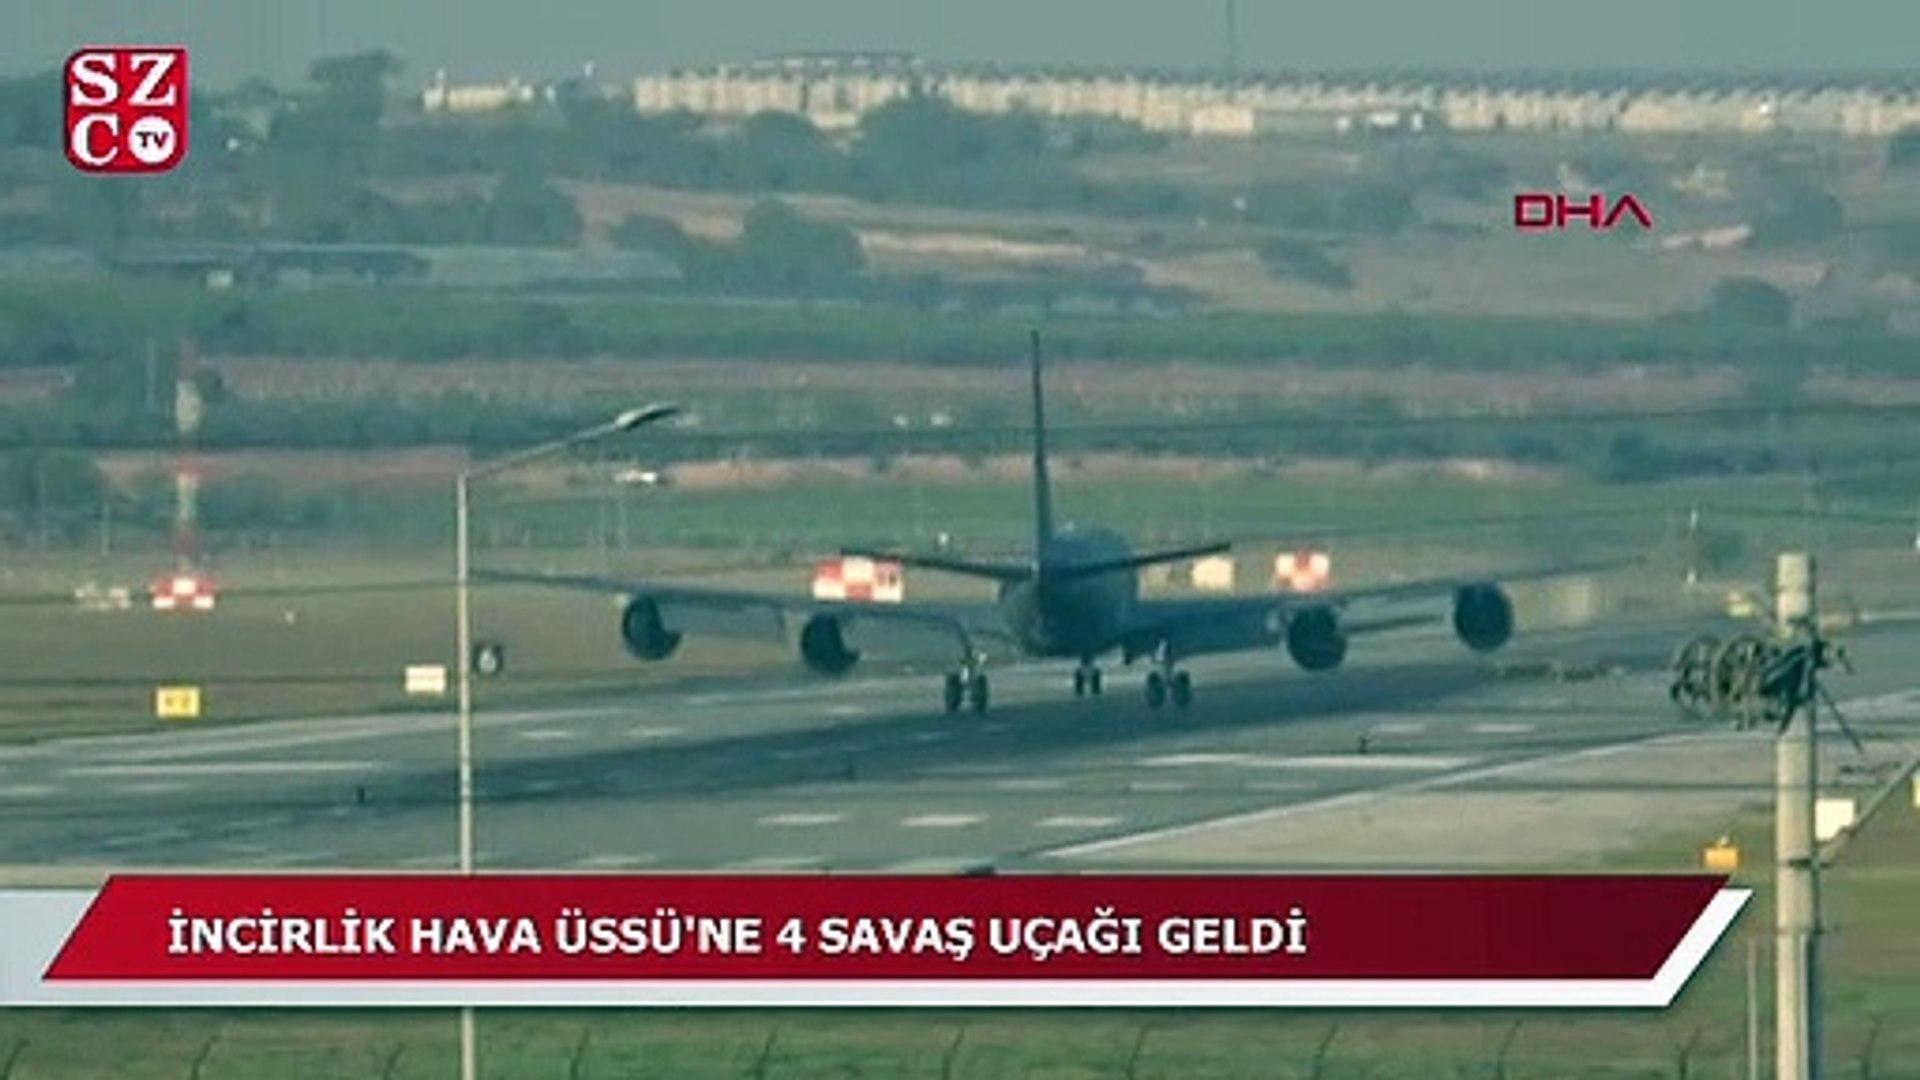 Adana Sarıçam Klima Servisi